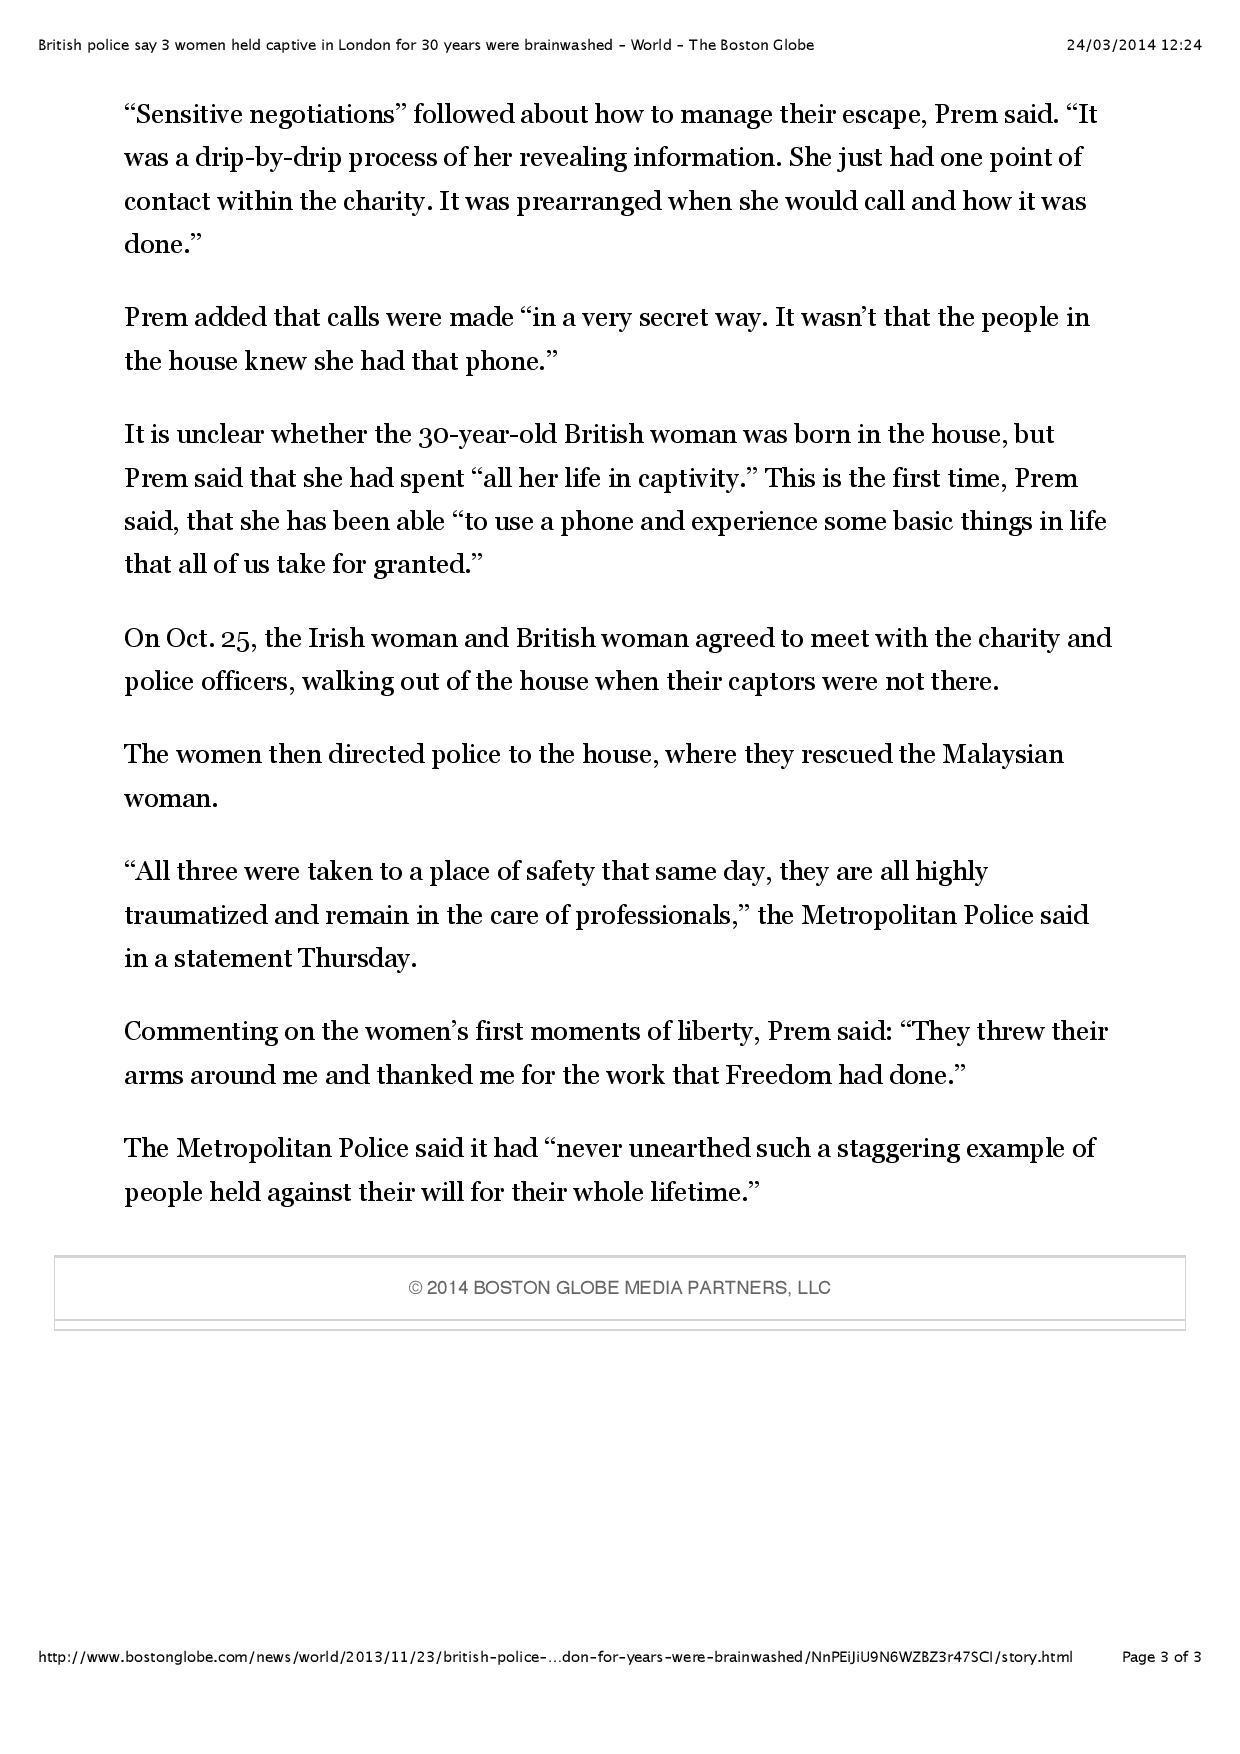 boston-globe-british-police-say-3-women-held-captive-in-london-for-30-years-were-brainwashed-world-the-boston-globe-page-003